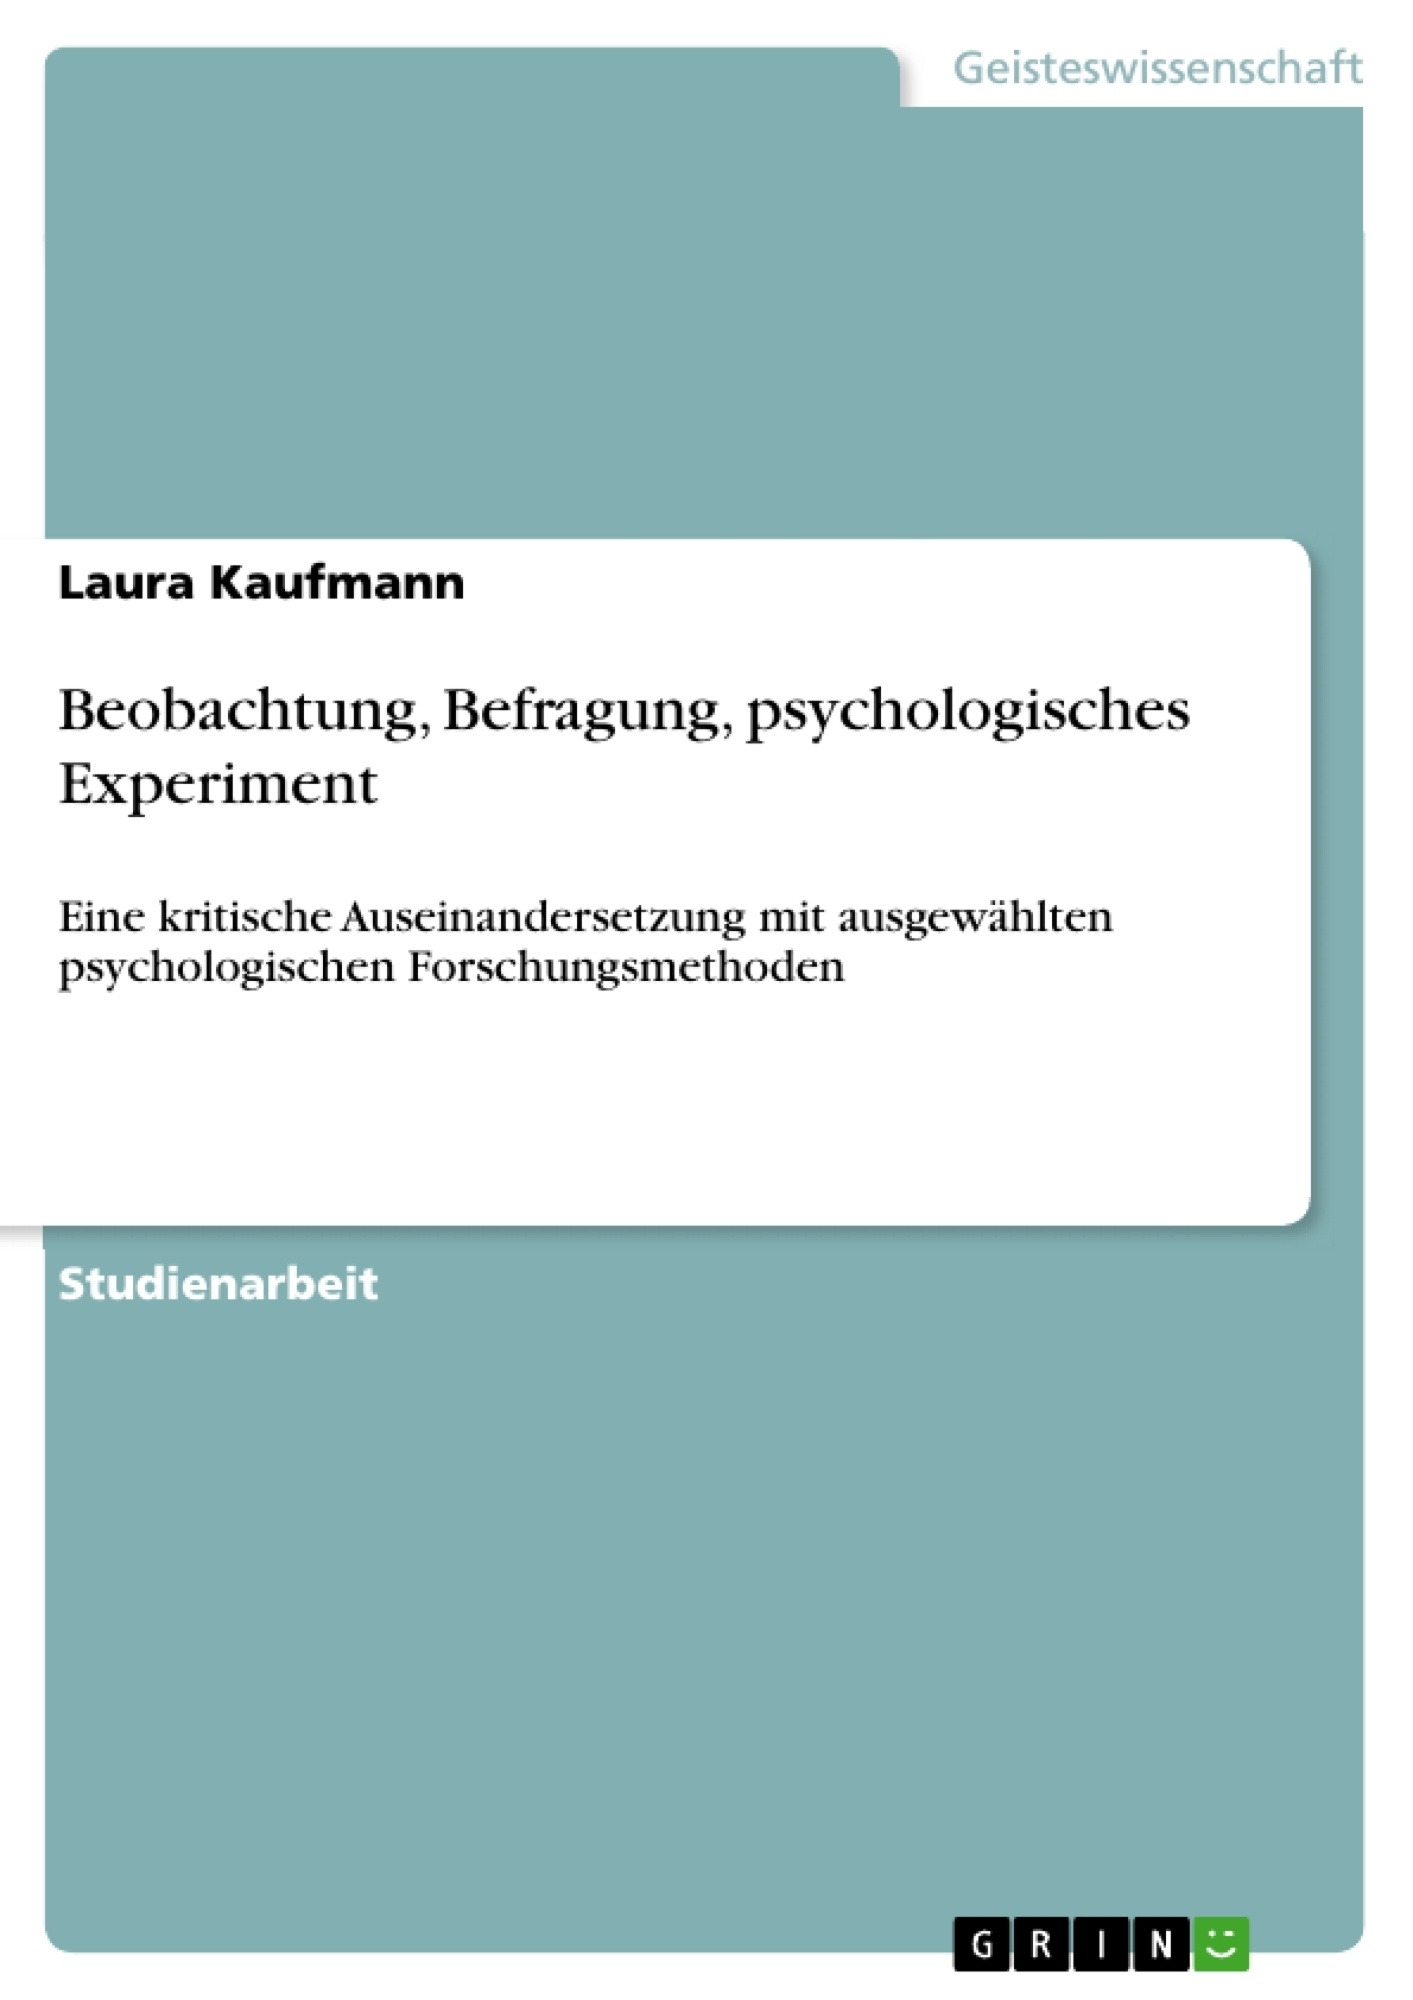 Titel: Beobachtung, Befragung, psychologisches Experiment